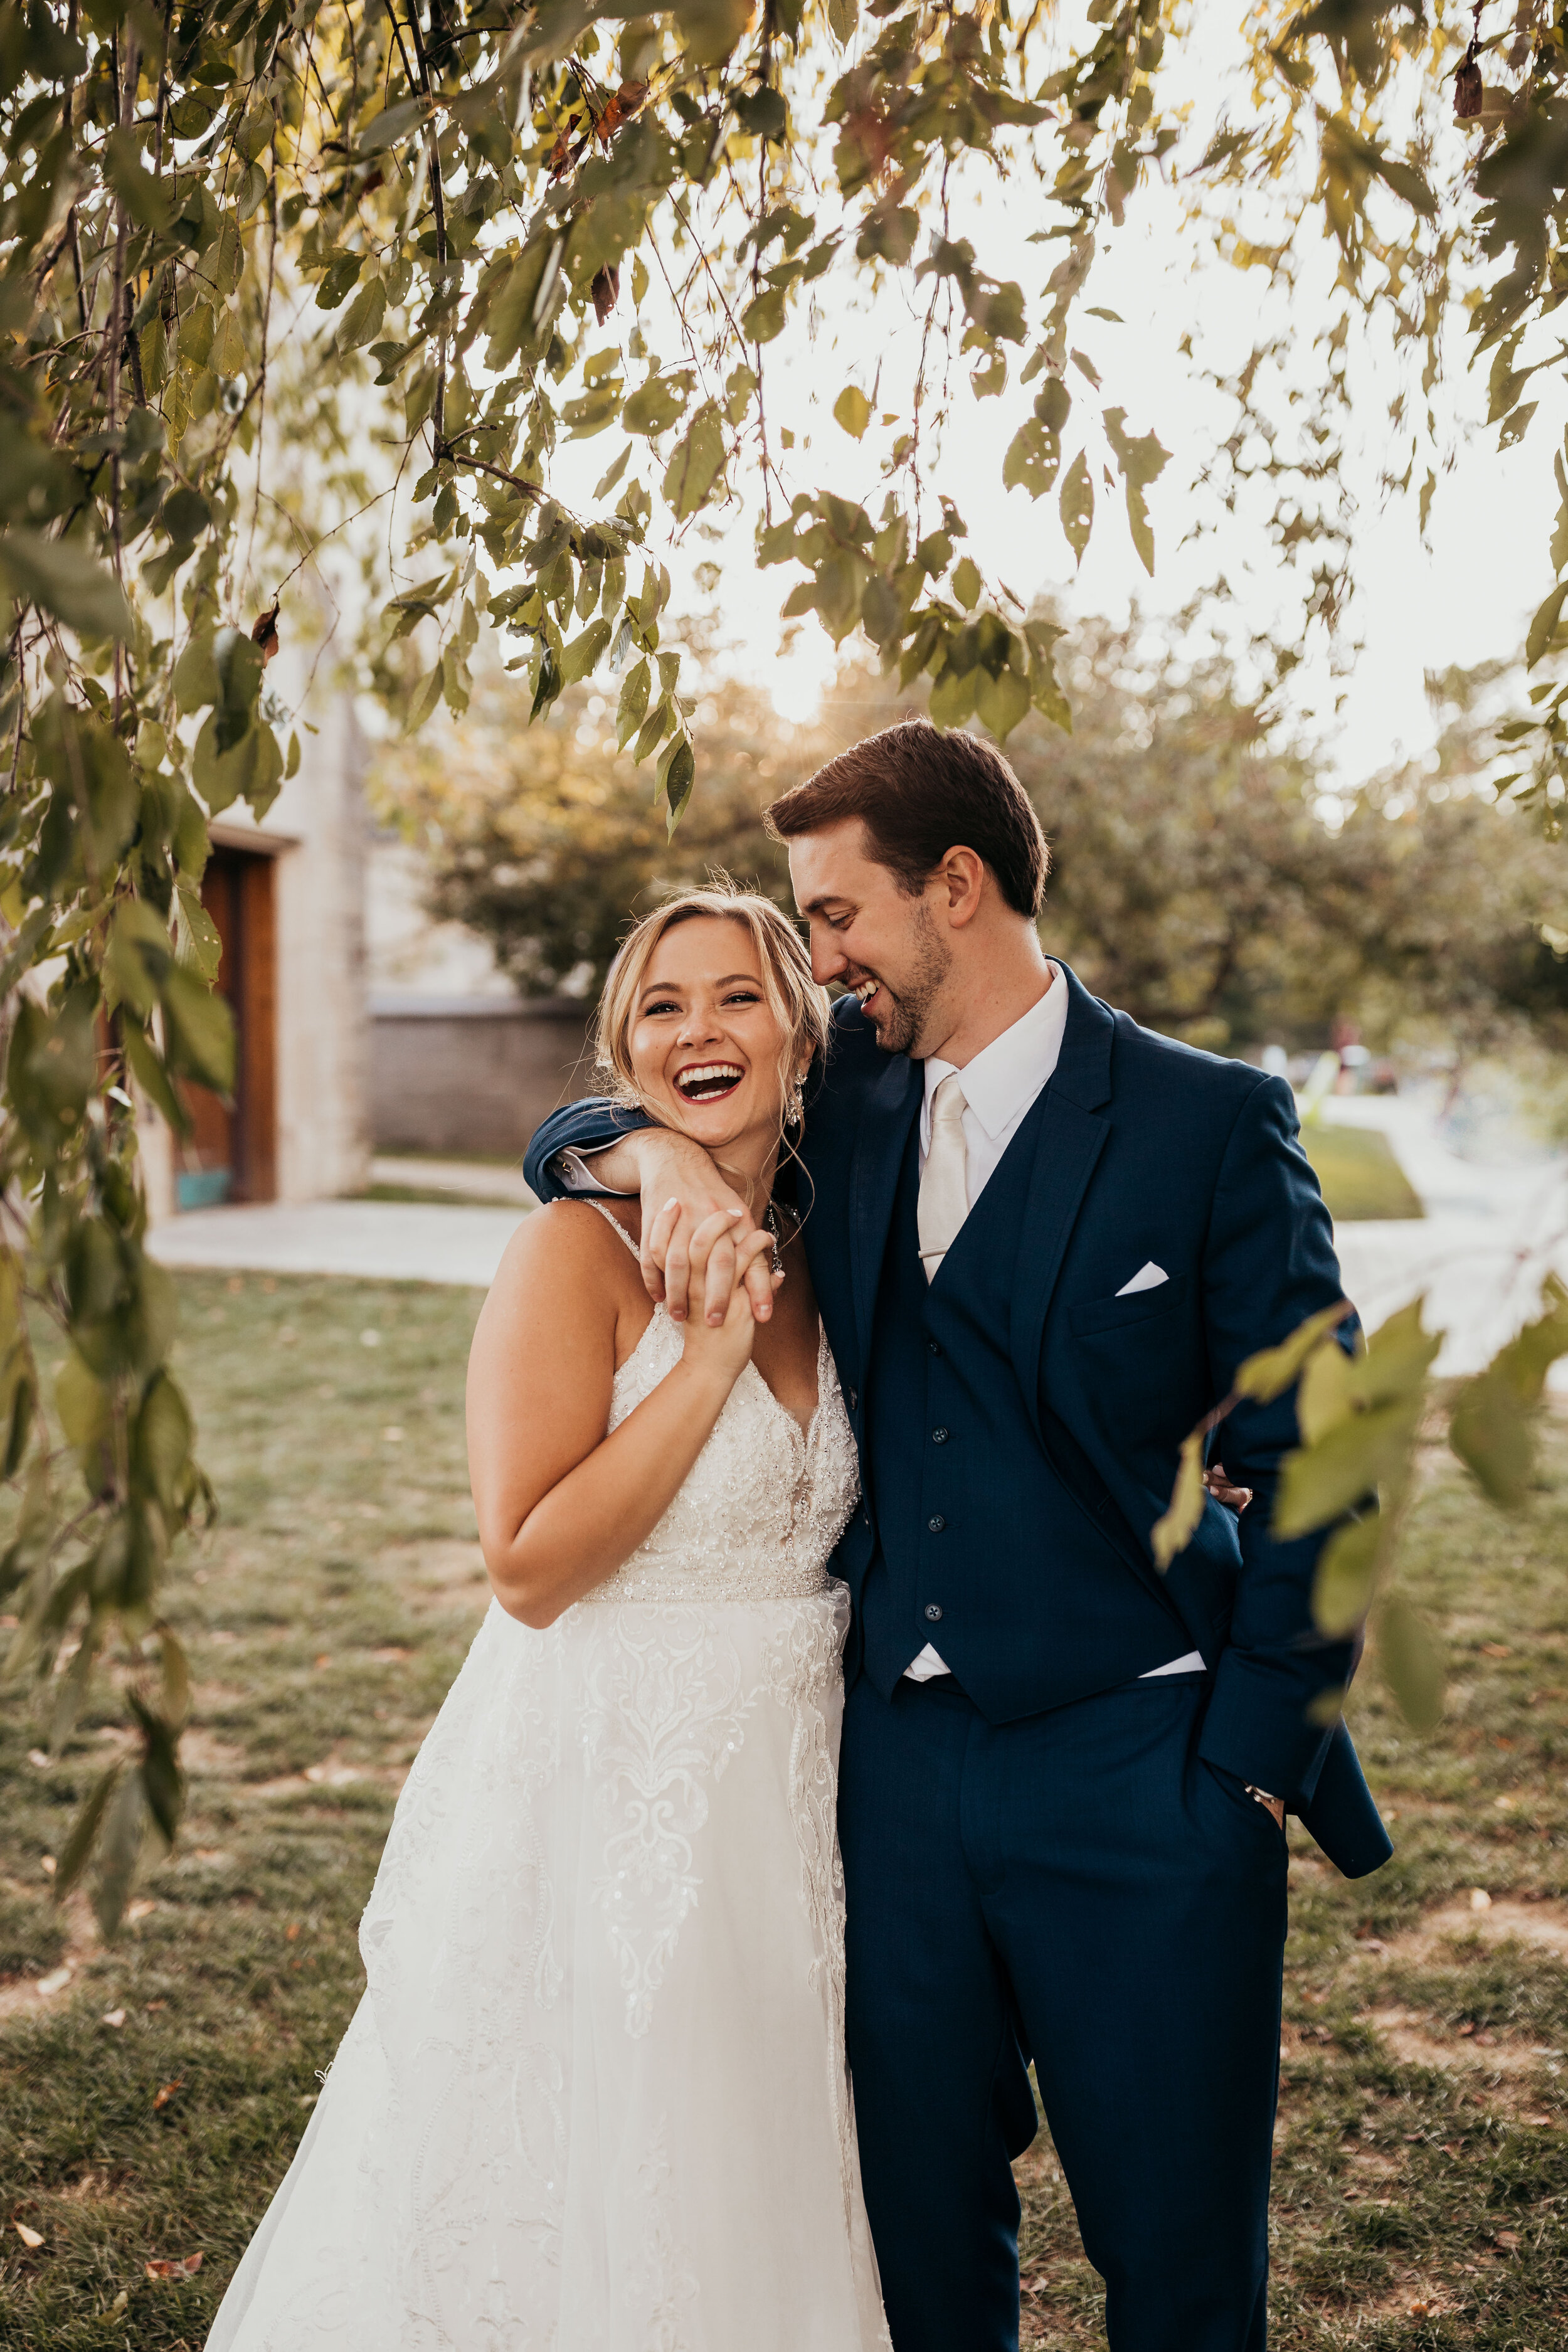 Pittsburgh wedding photography - Hartwood Acres Mansion wedding-1169.jpg